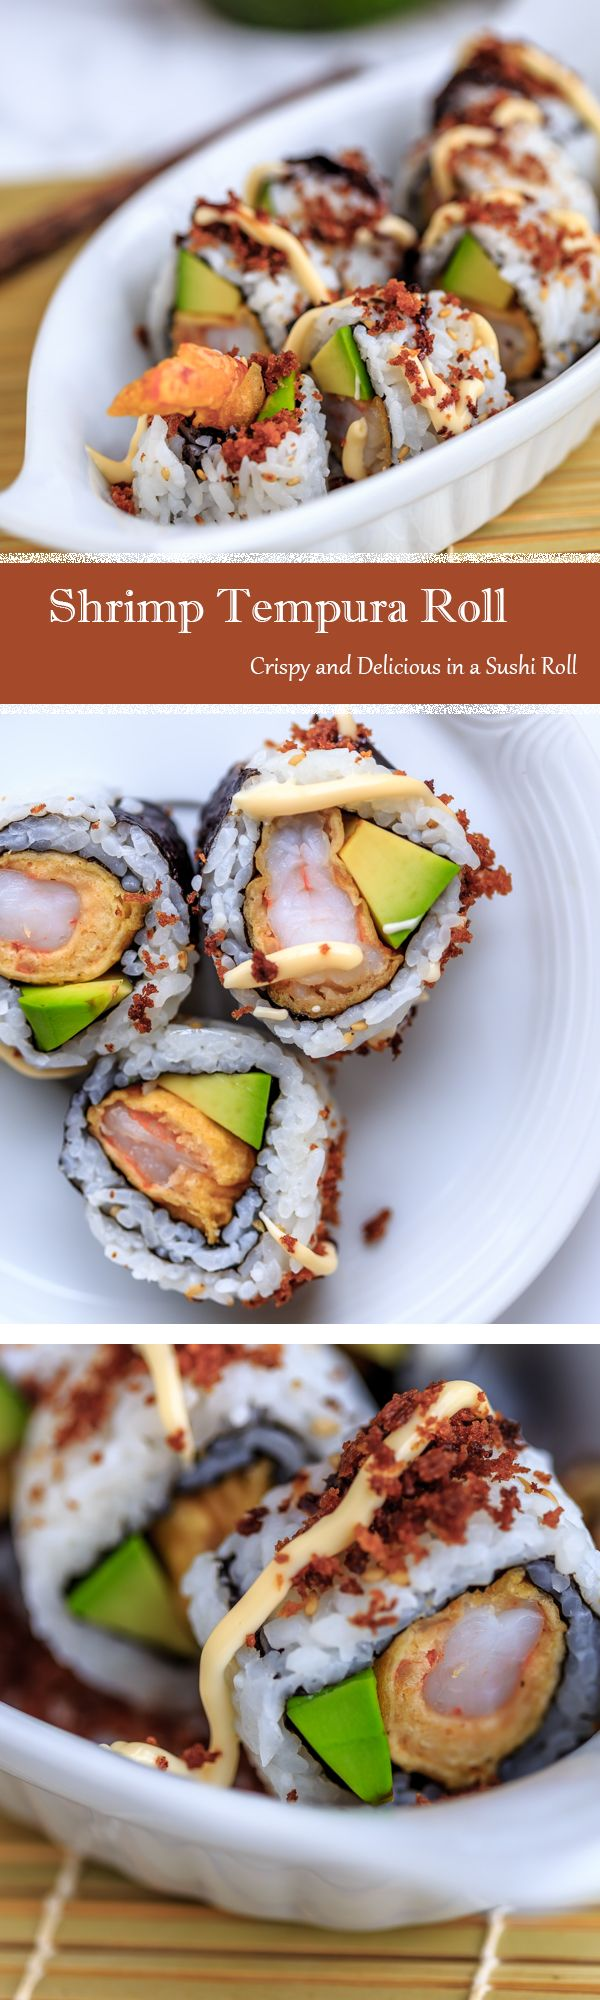 Recipe for Shrimp Tempura Sushi Roll - #Recipes #Sushi #Japanese #Crispy